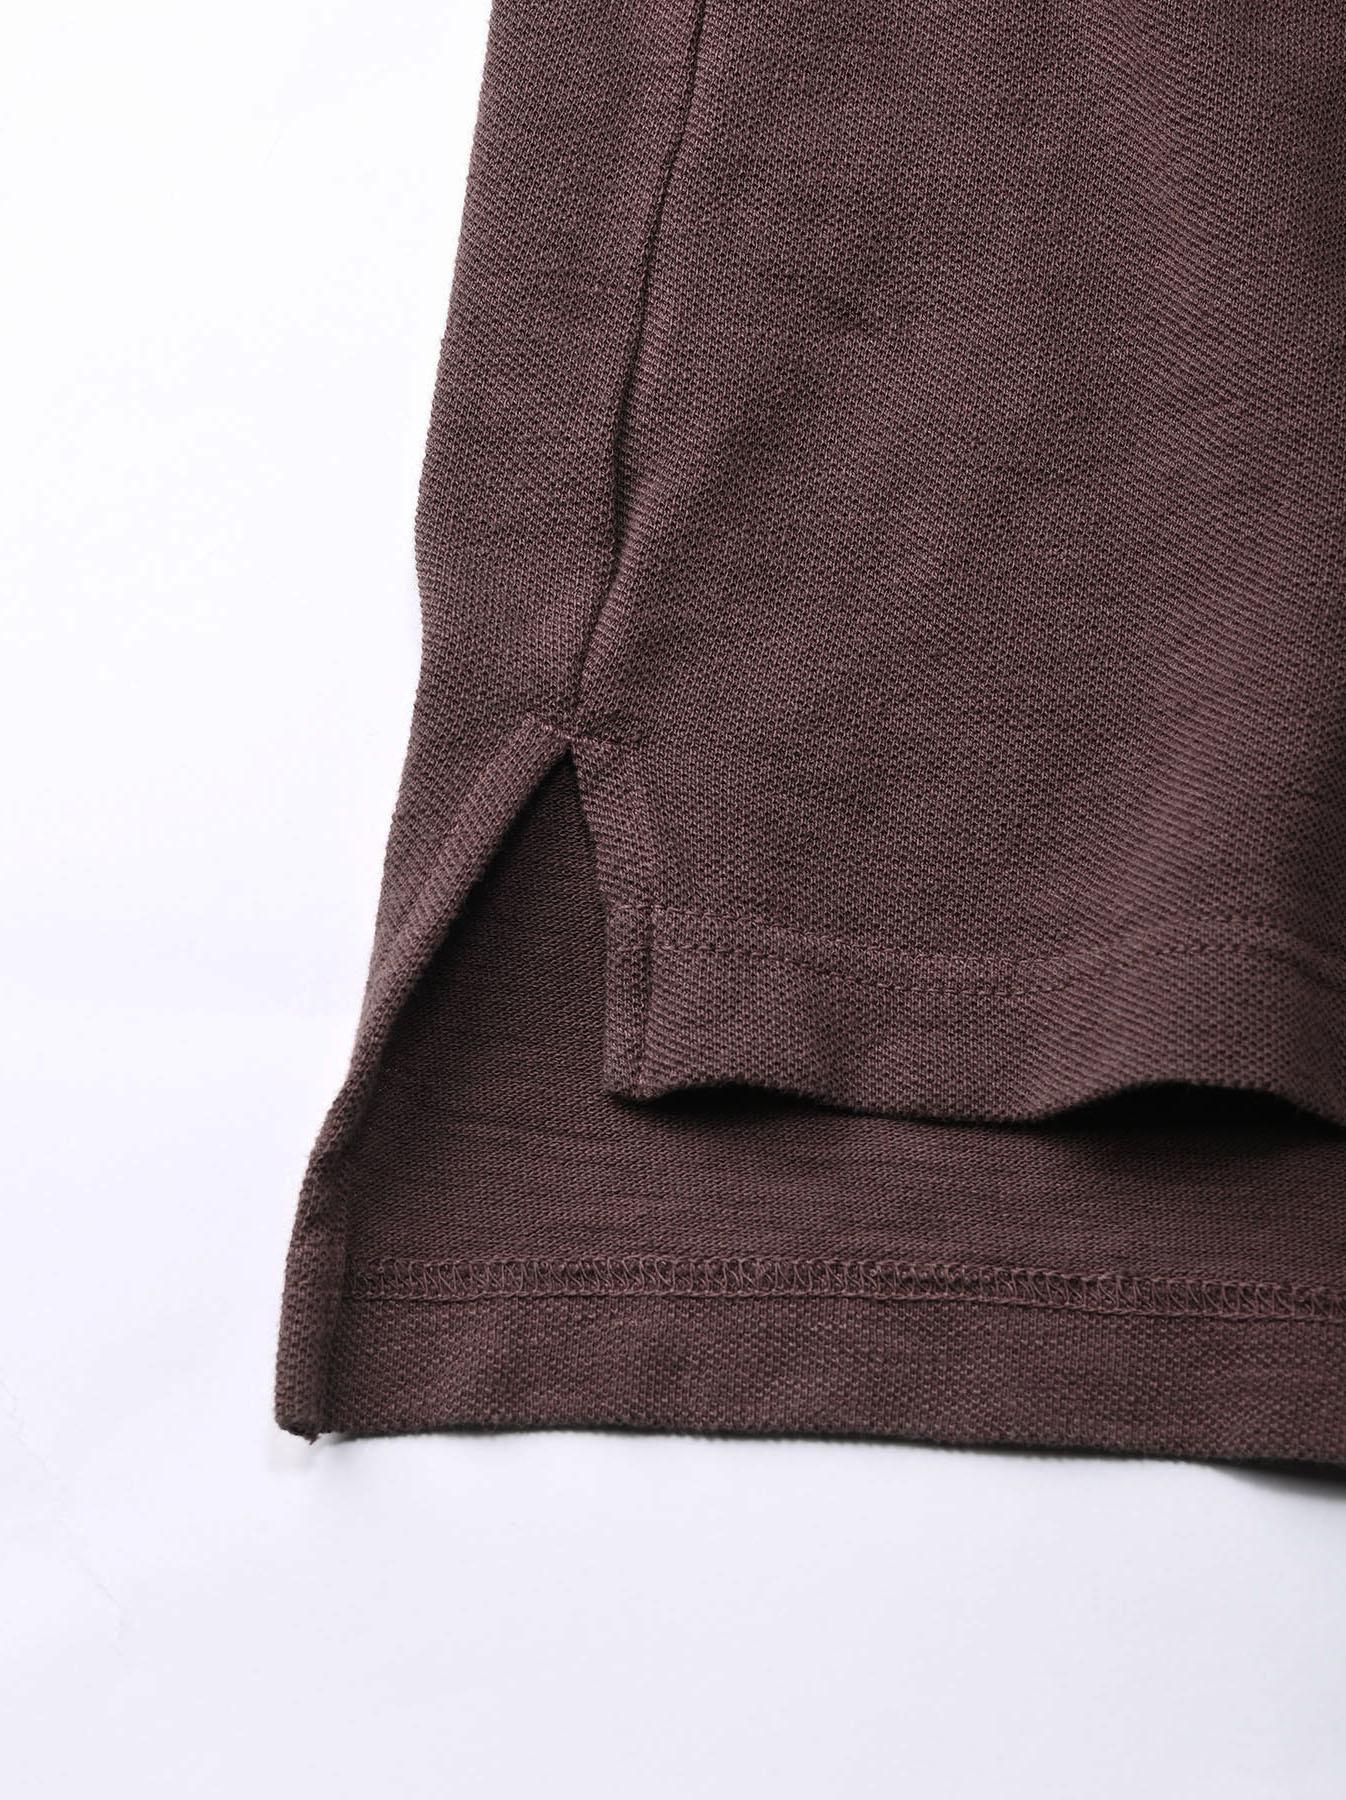 Kanoko Shiokaze Long-sleeved Square Polo Shirt (0521)-12